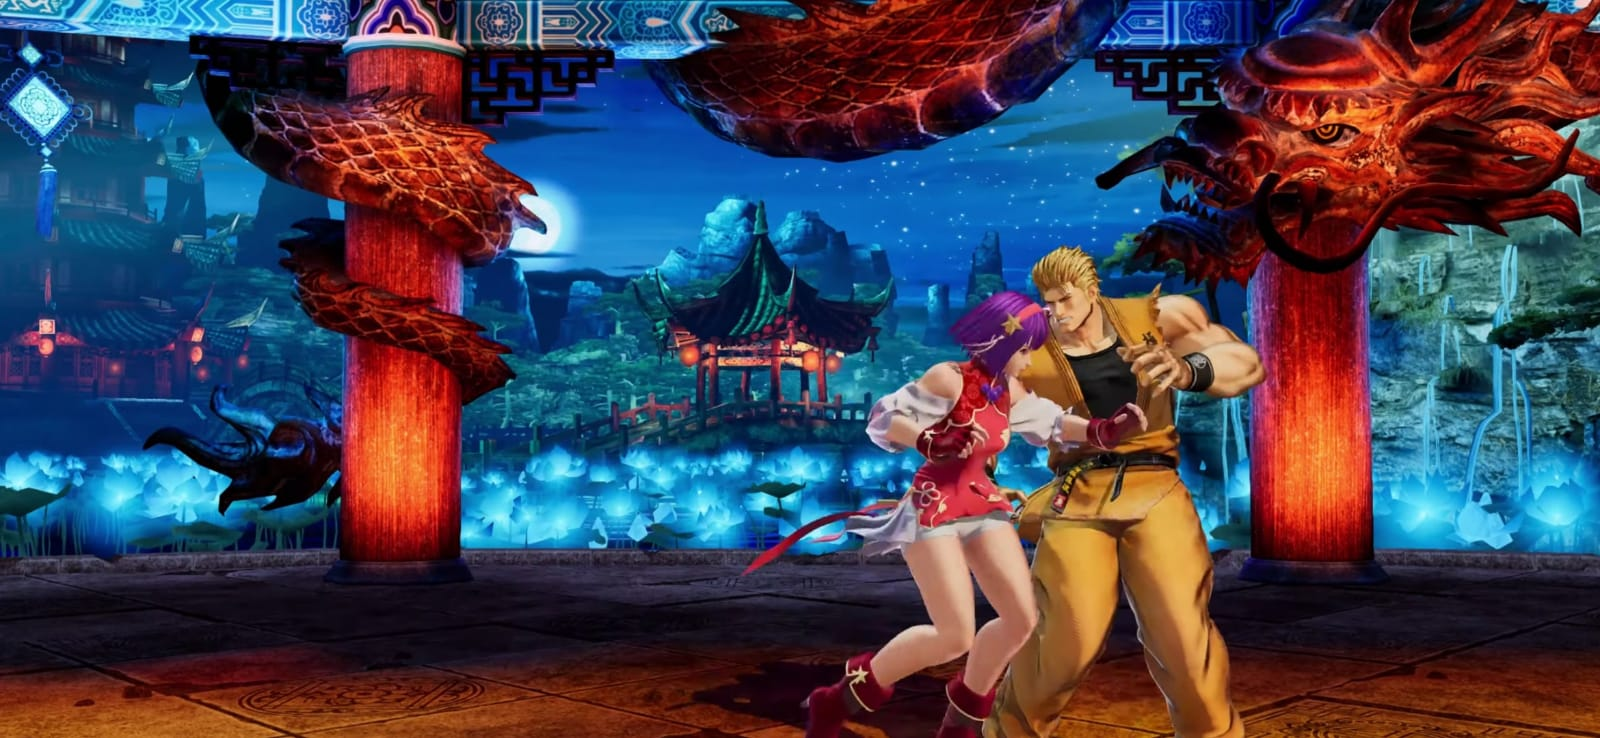 Se confirma a Athena Asamiya en The King of Fighters XV 2